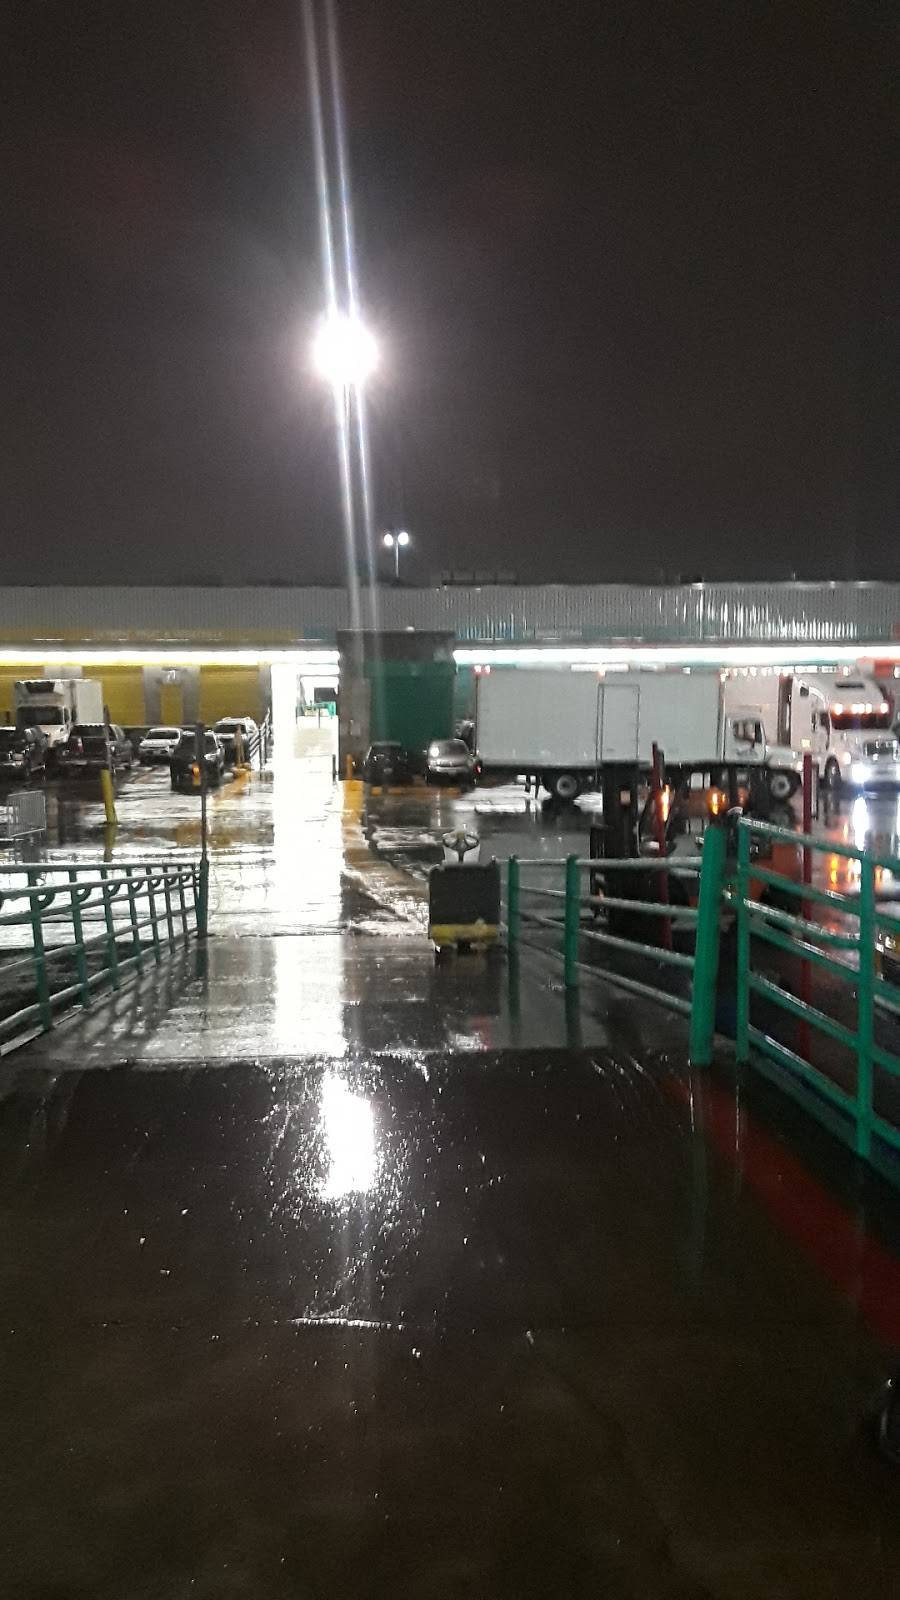 Jalisco Fresh Produce Inc - store  | Photo 8 of 8 | Address: 1601 E Olympic Blvd, Los Angeles, CA 90021, USA | Phone: (213) 629-0993